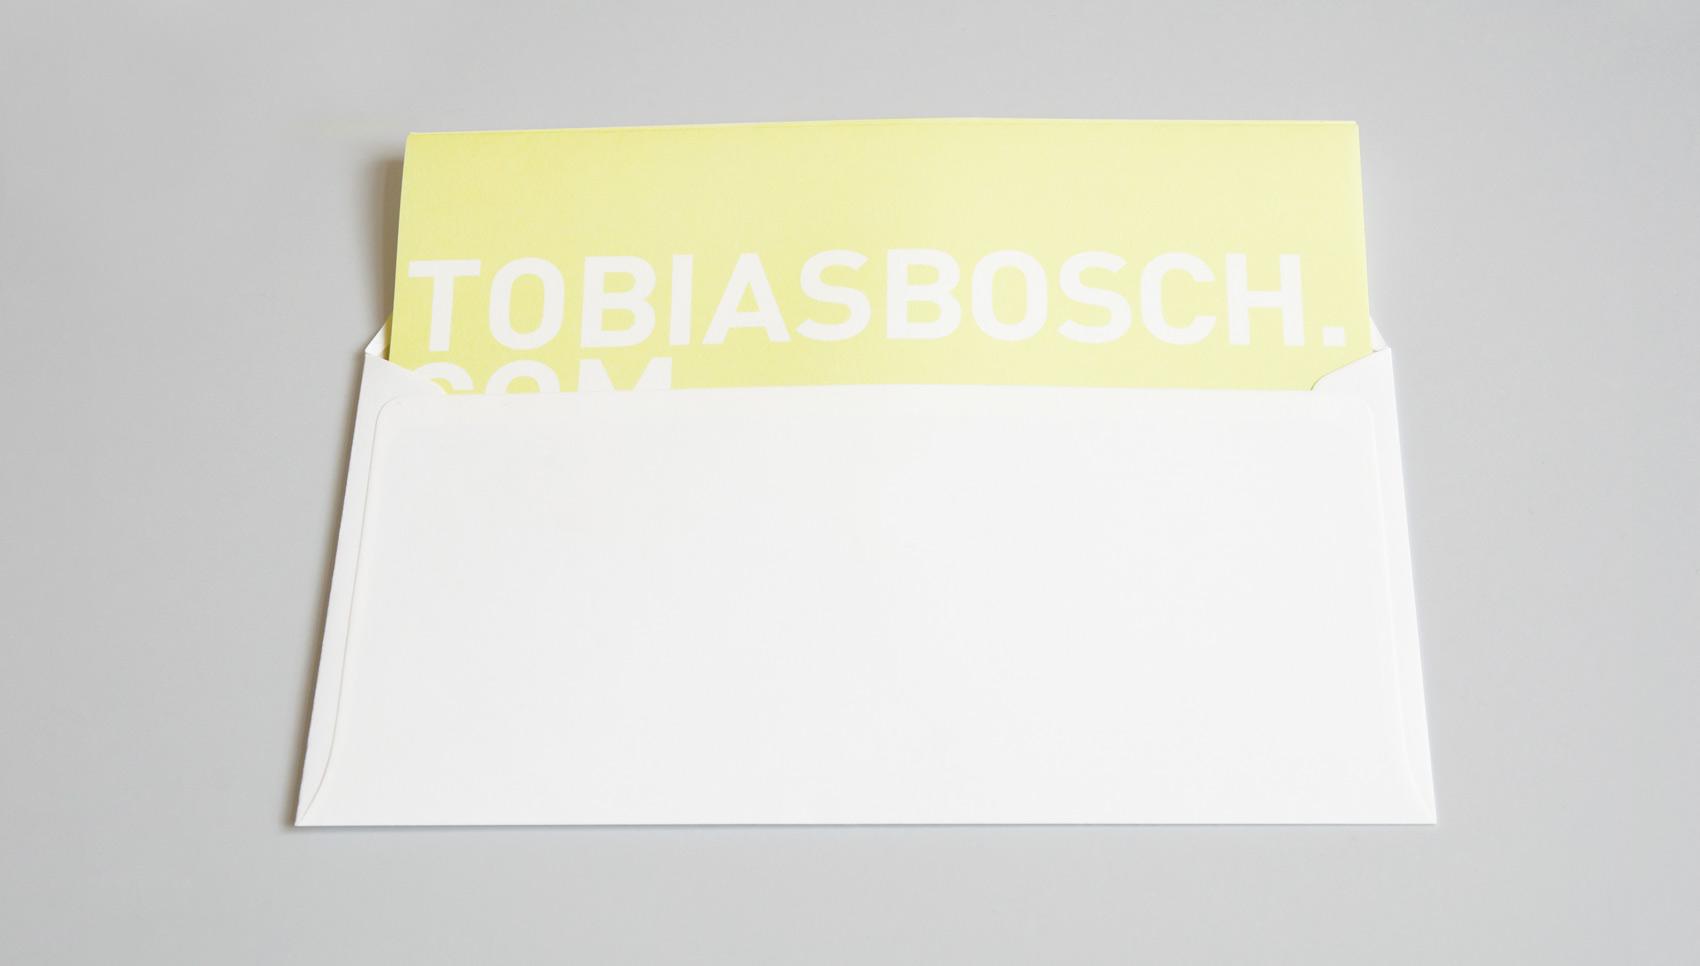 Tobias Bosch. Corporate Design.